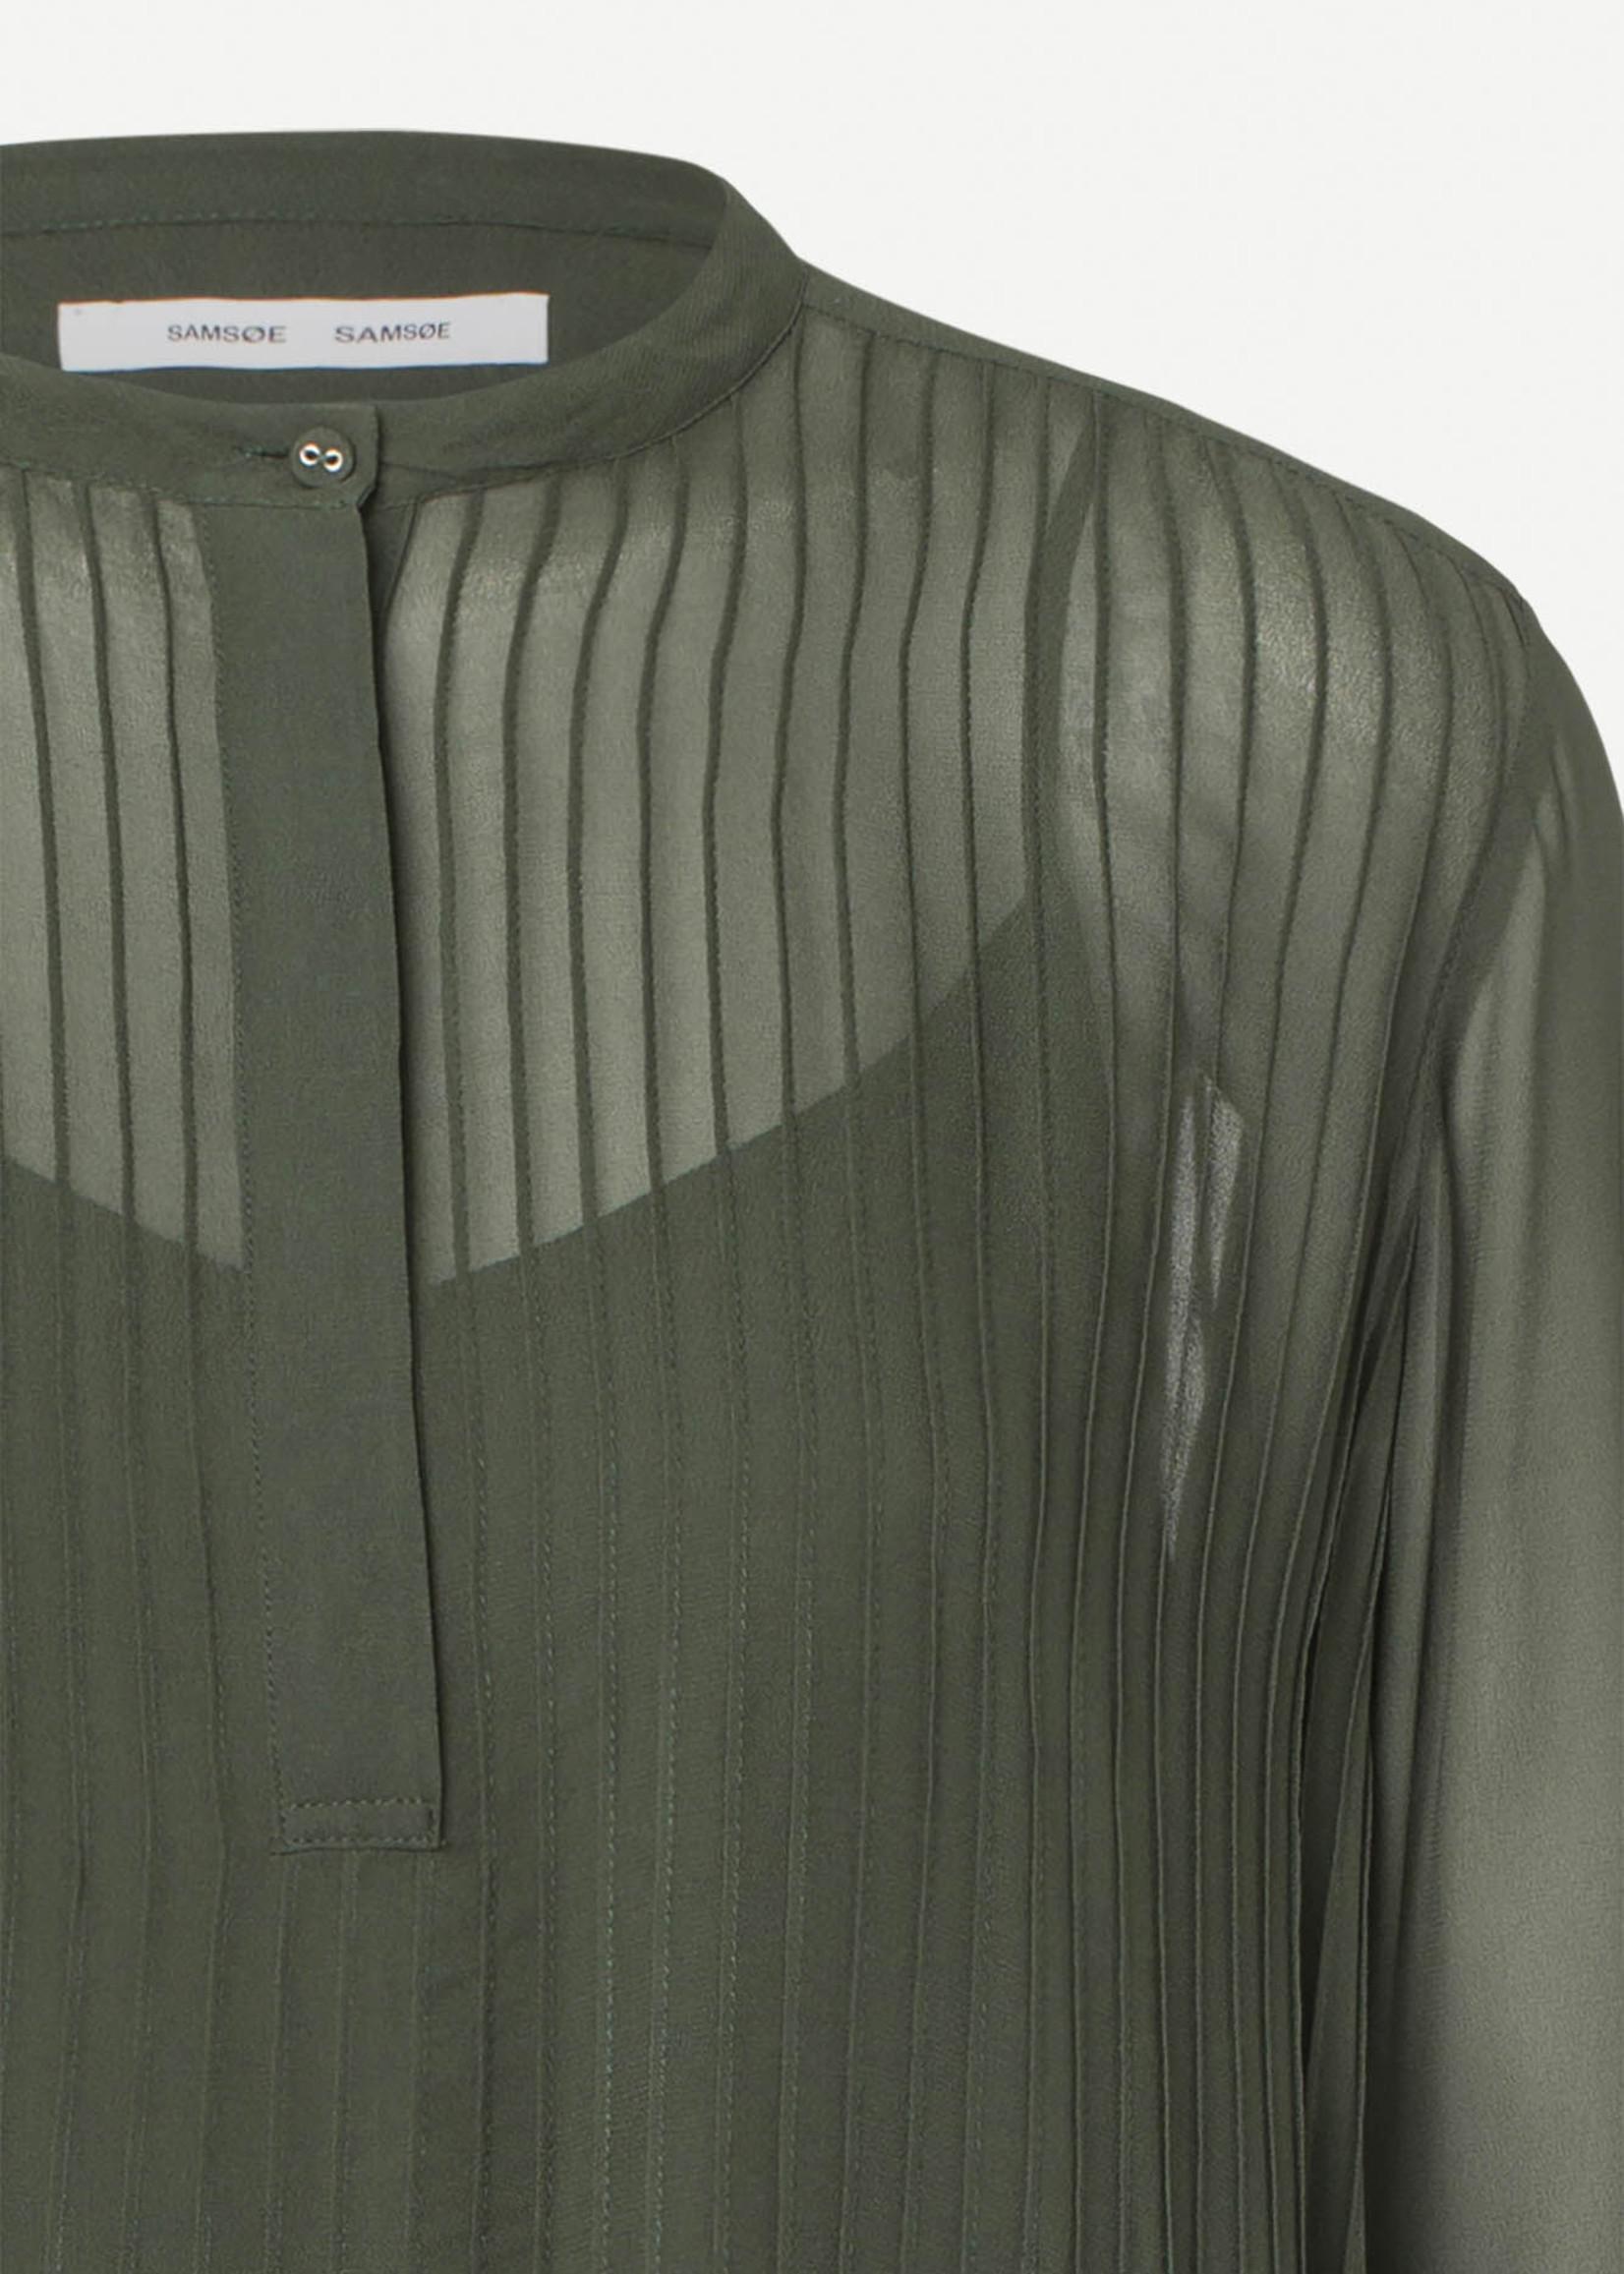 Samsoe & Samsoe Elm Shirt Dress 9695